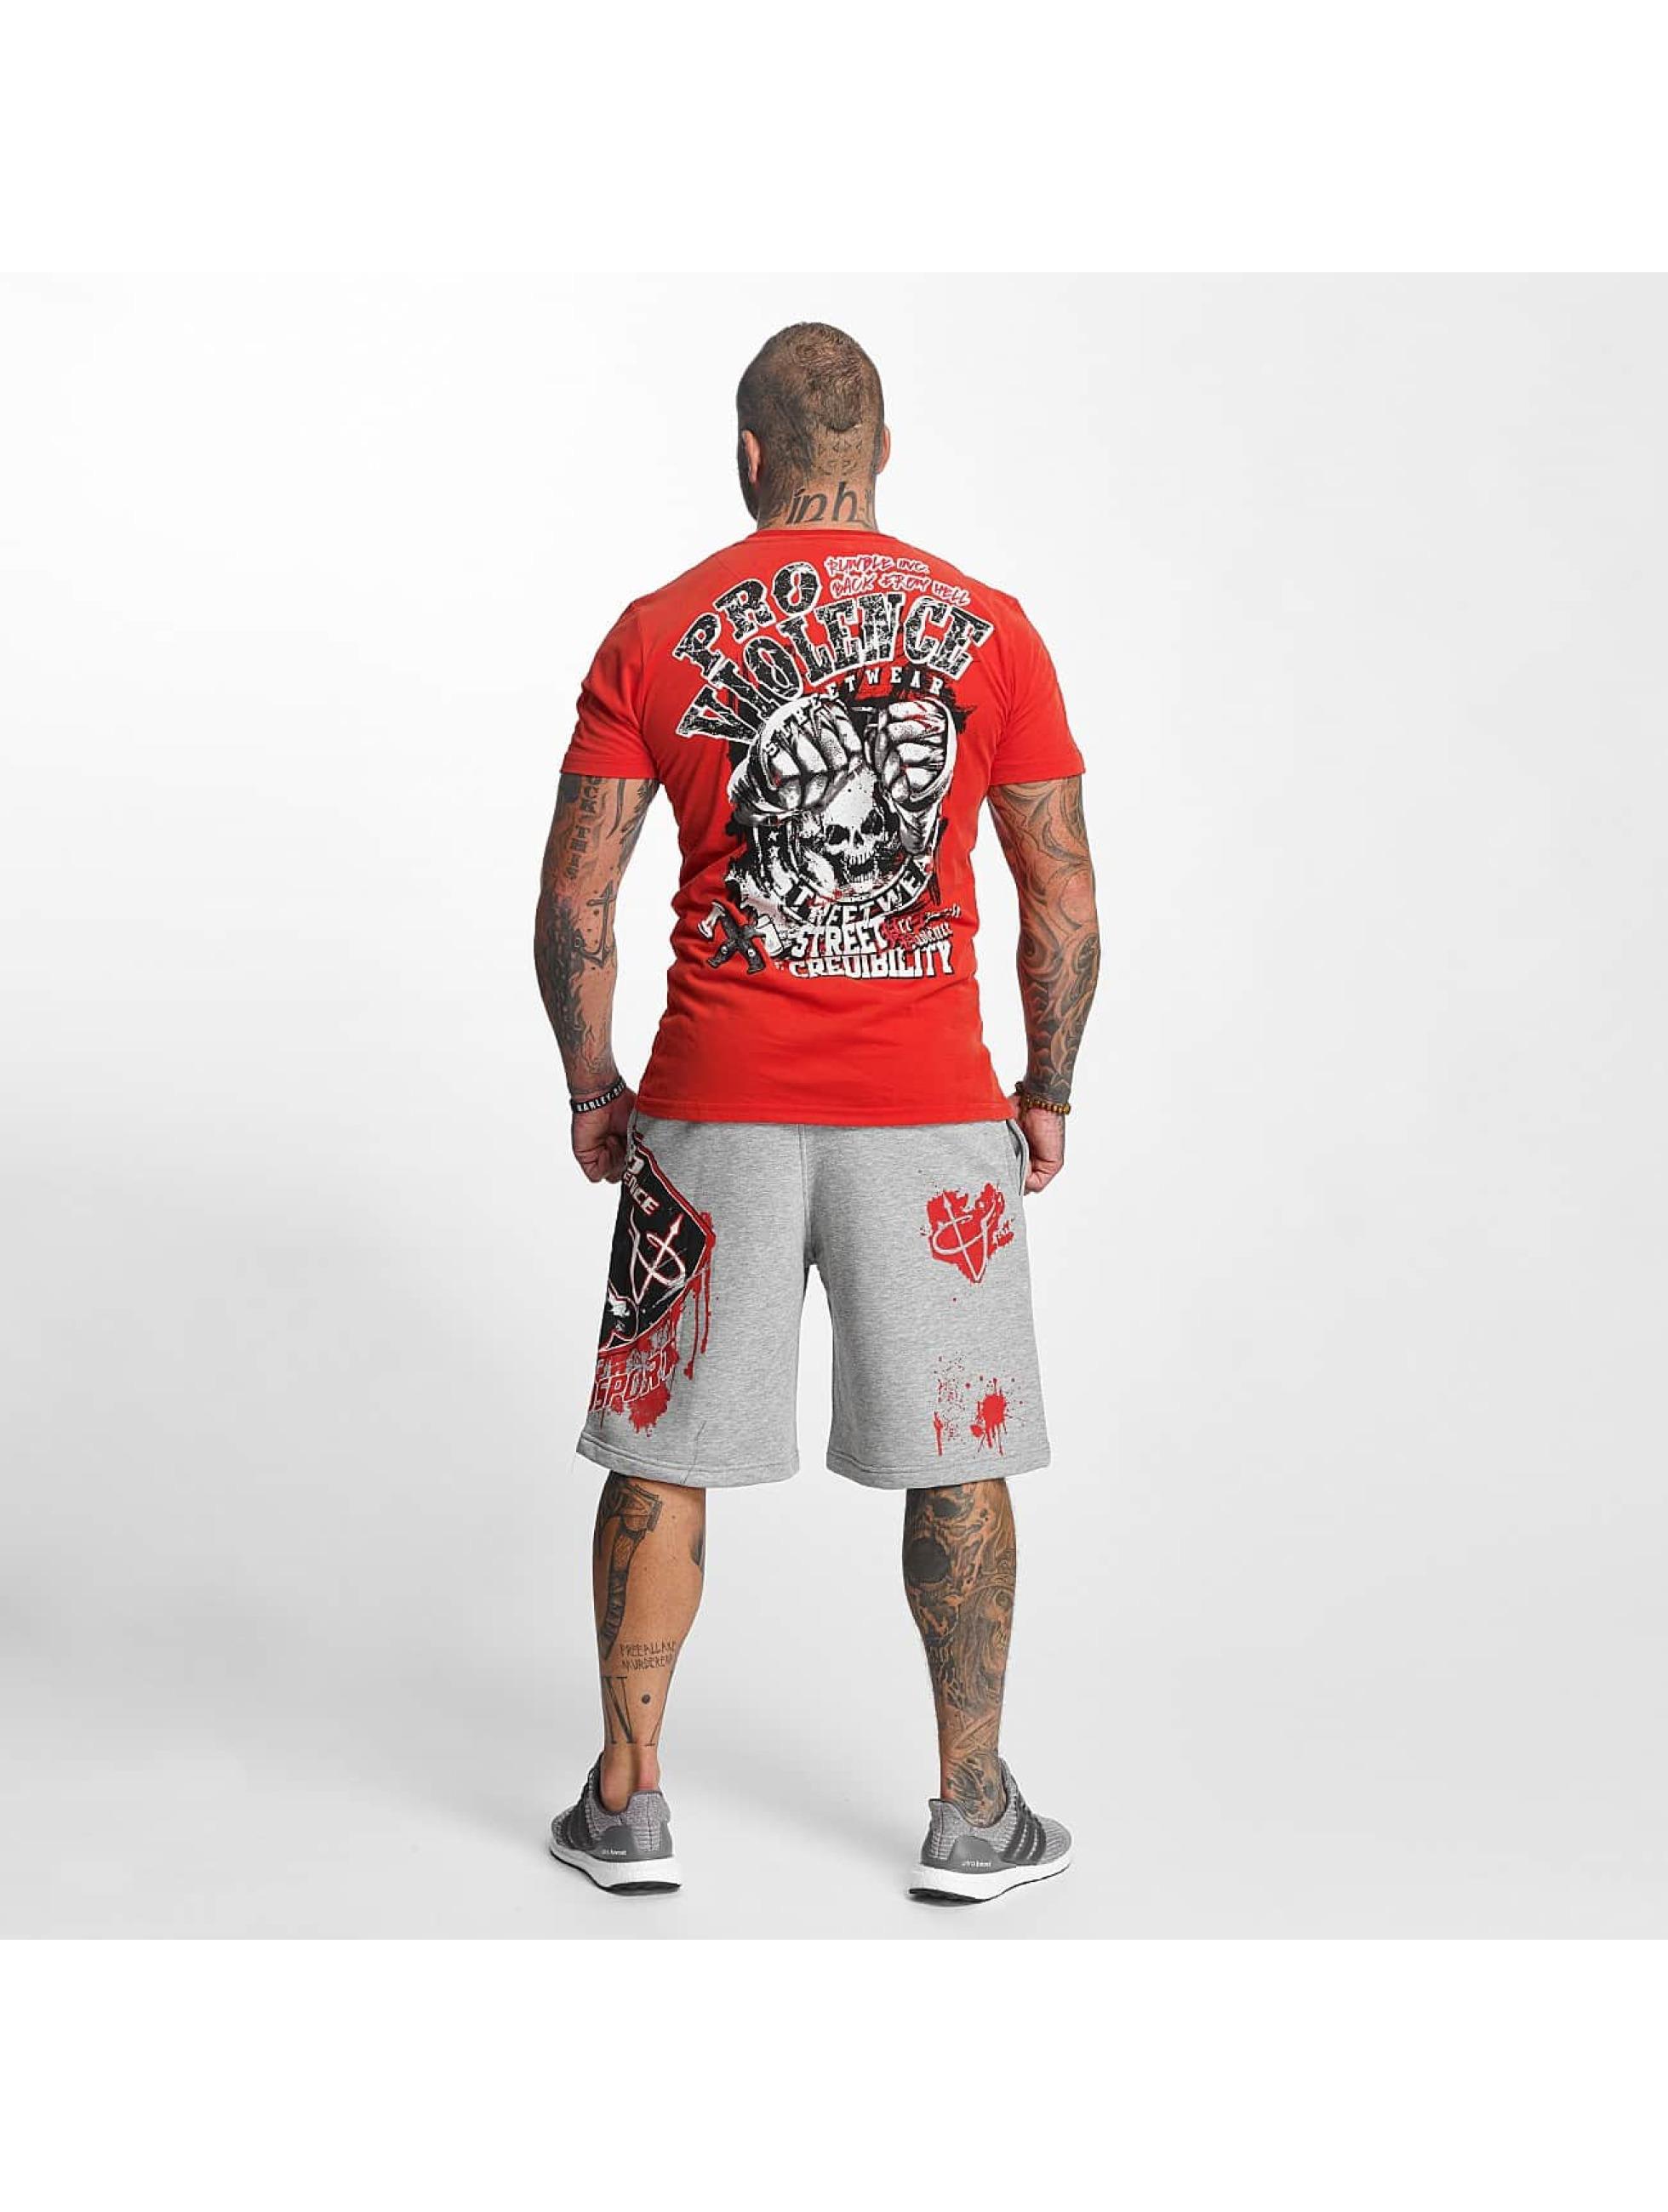 Pro Violence Streetwear T-Shirt Street Ceidbilty red